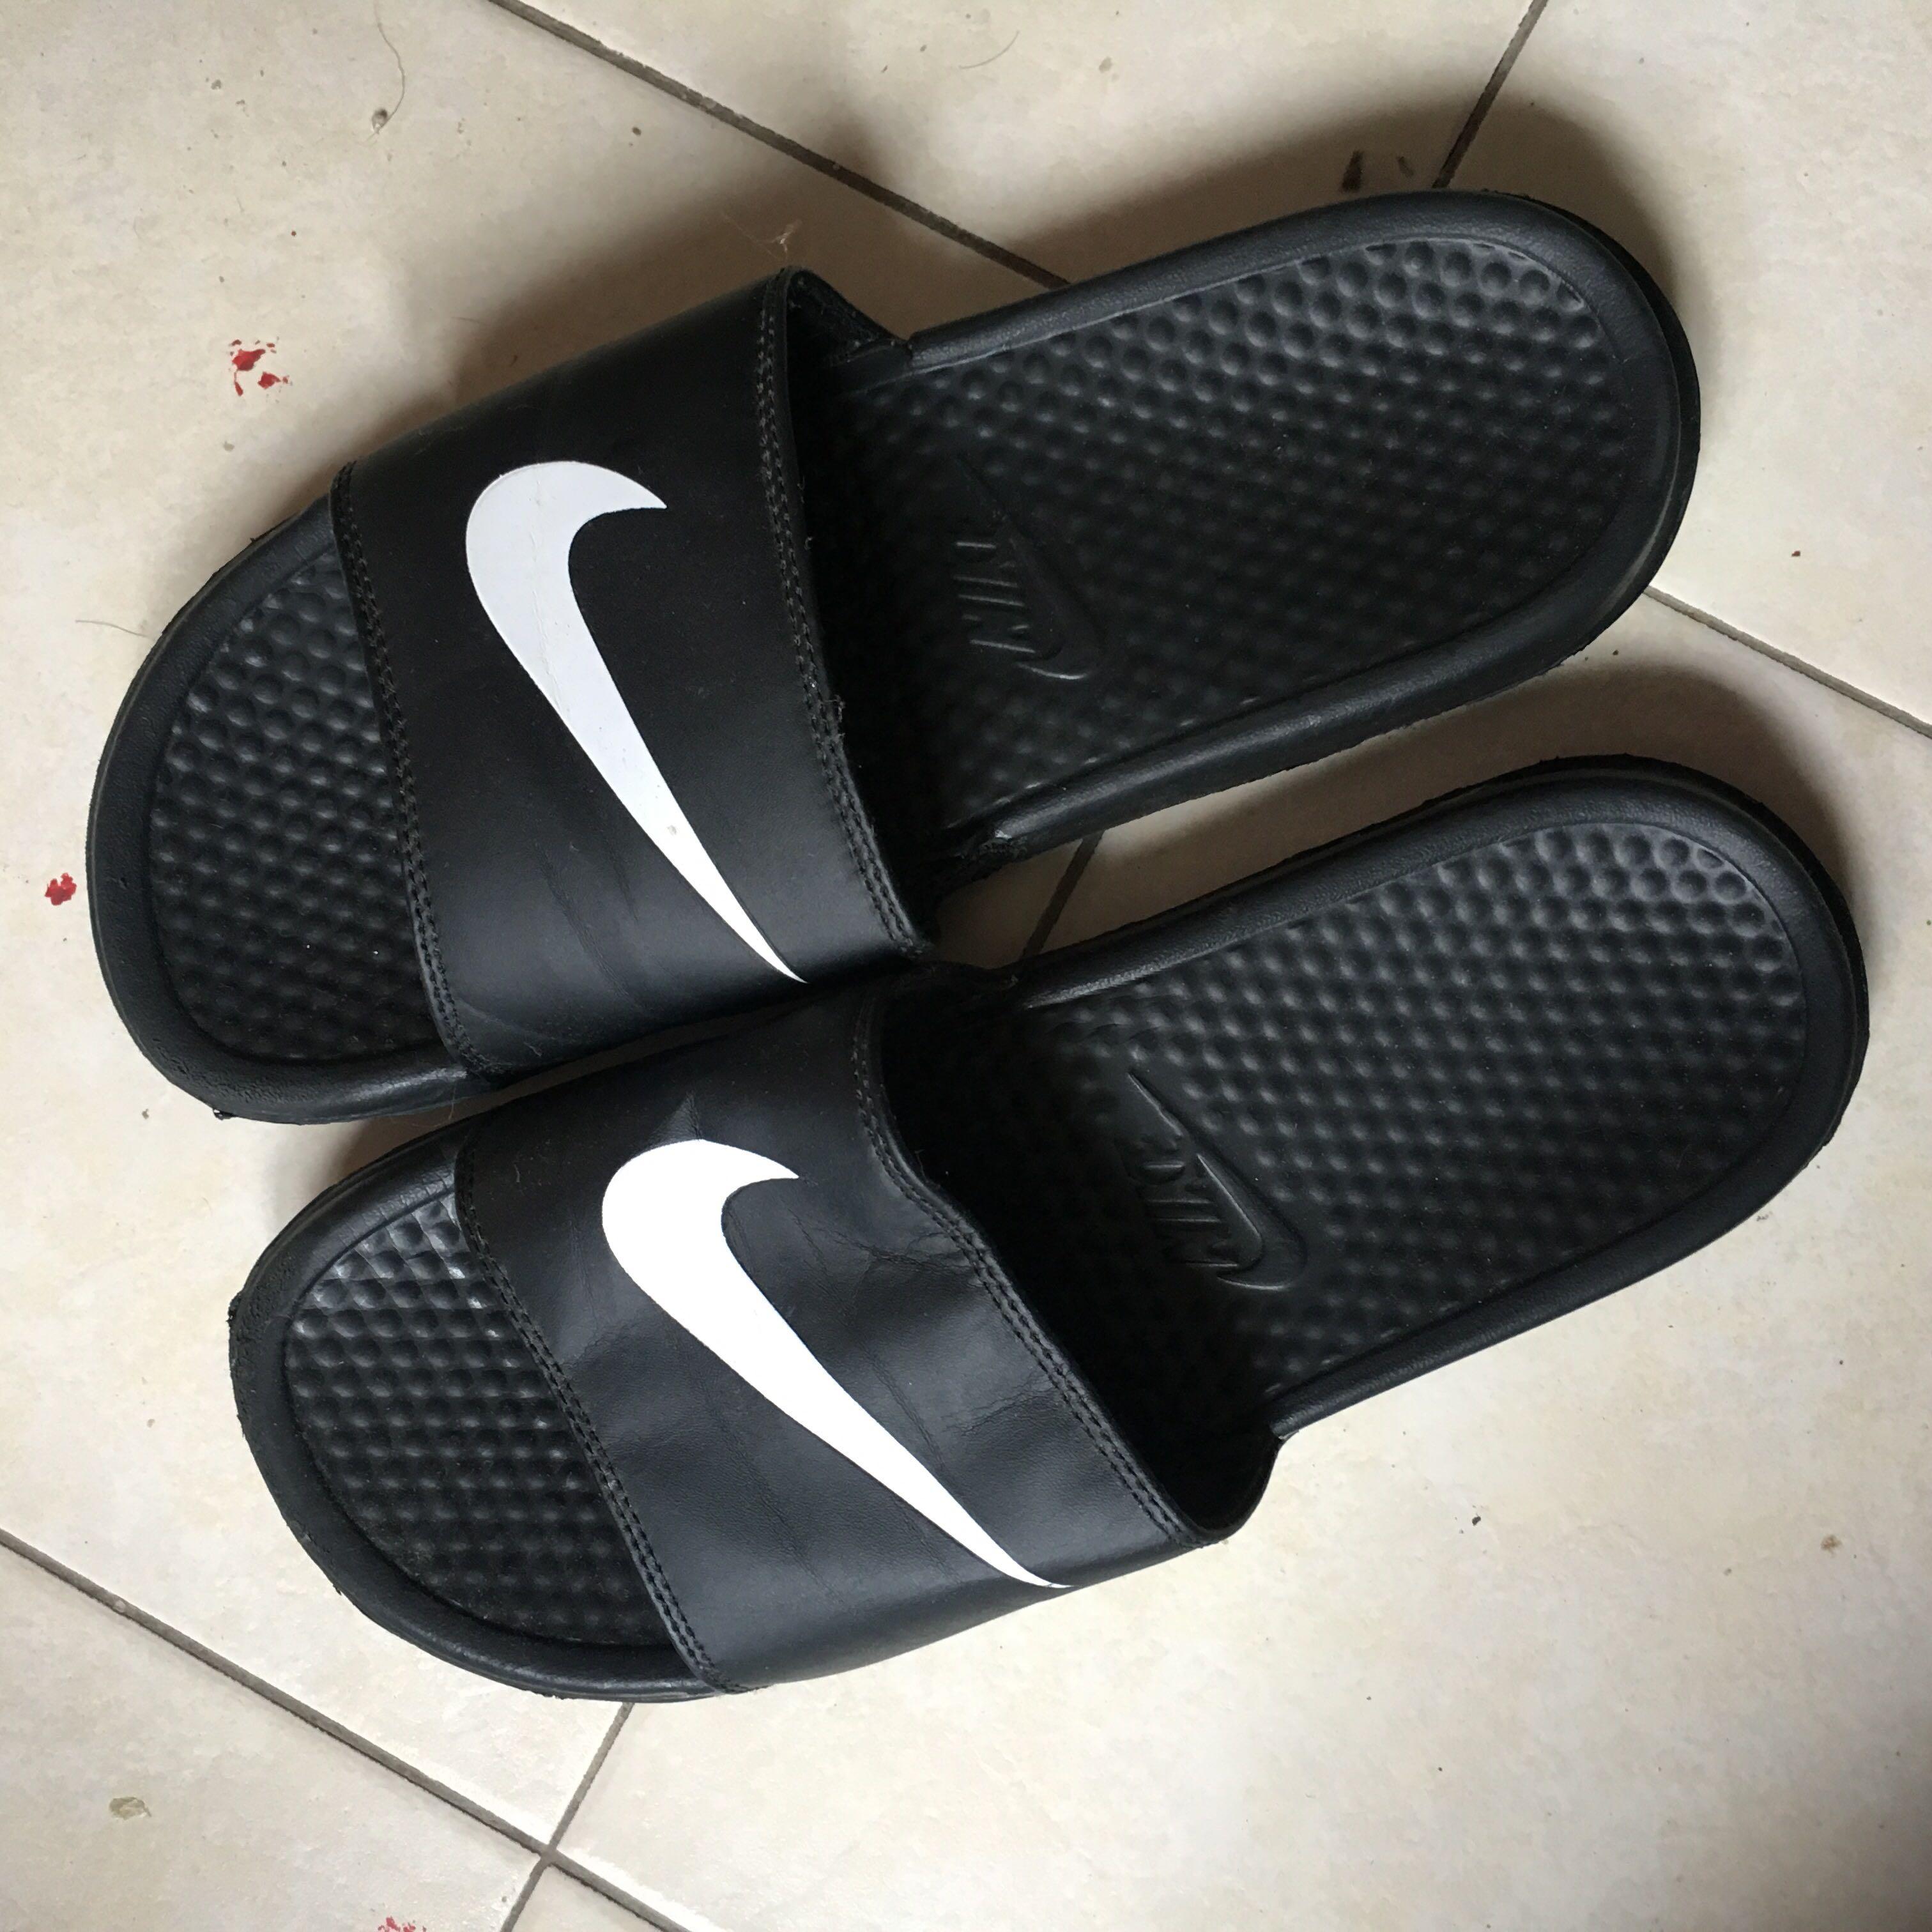 e615c0930 ... new zealand nike benassi swoosh slides mens fashion footwear slippers  sandals on carousell 7db54 67b8e